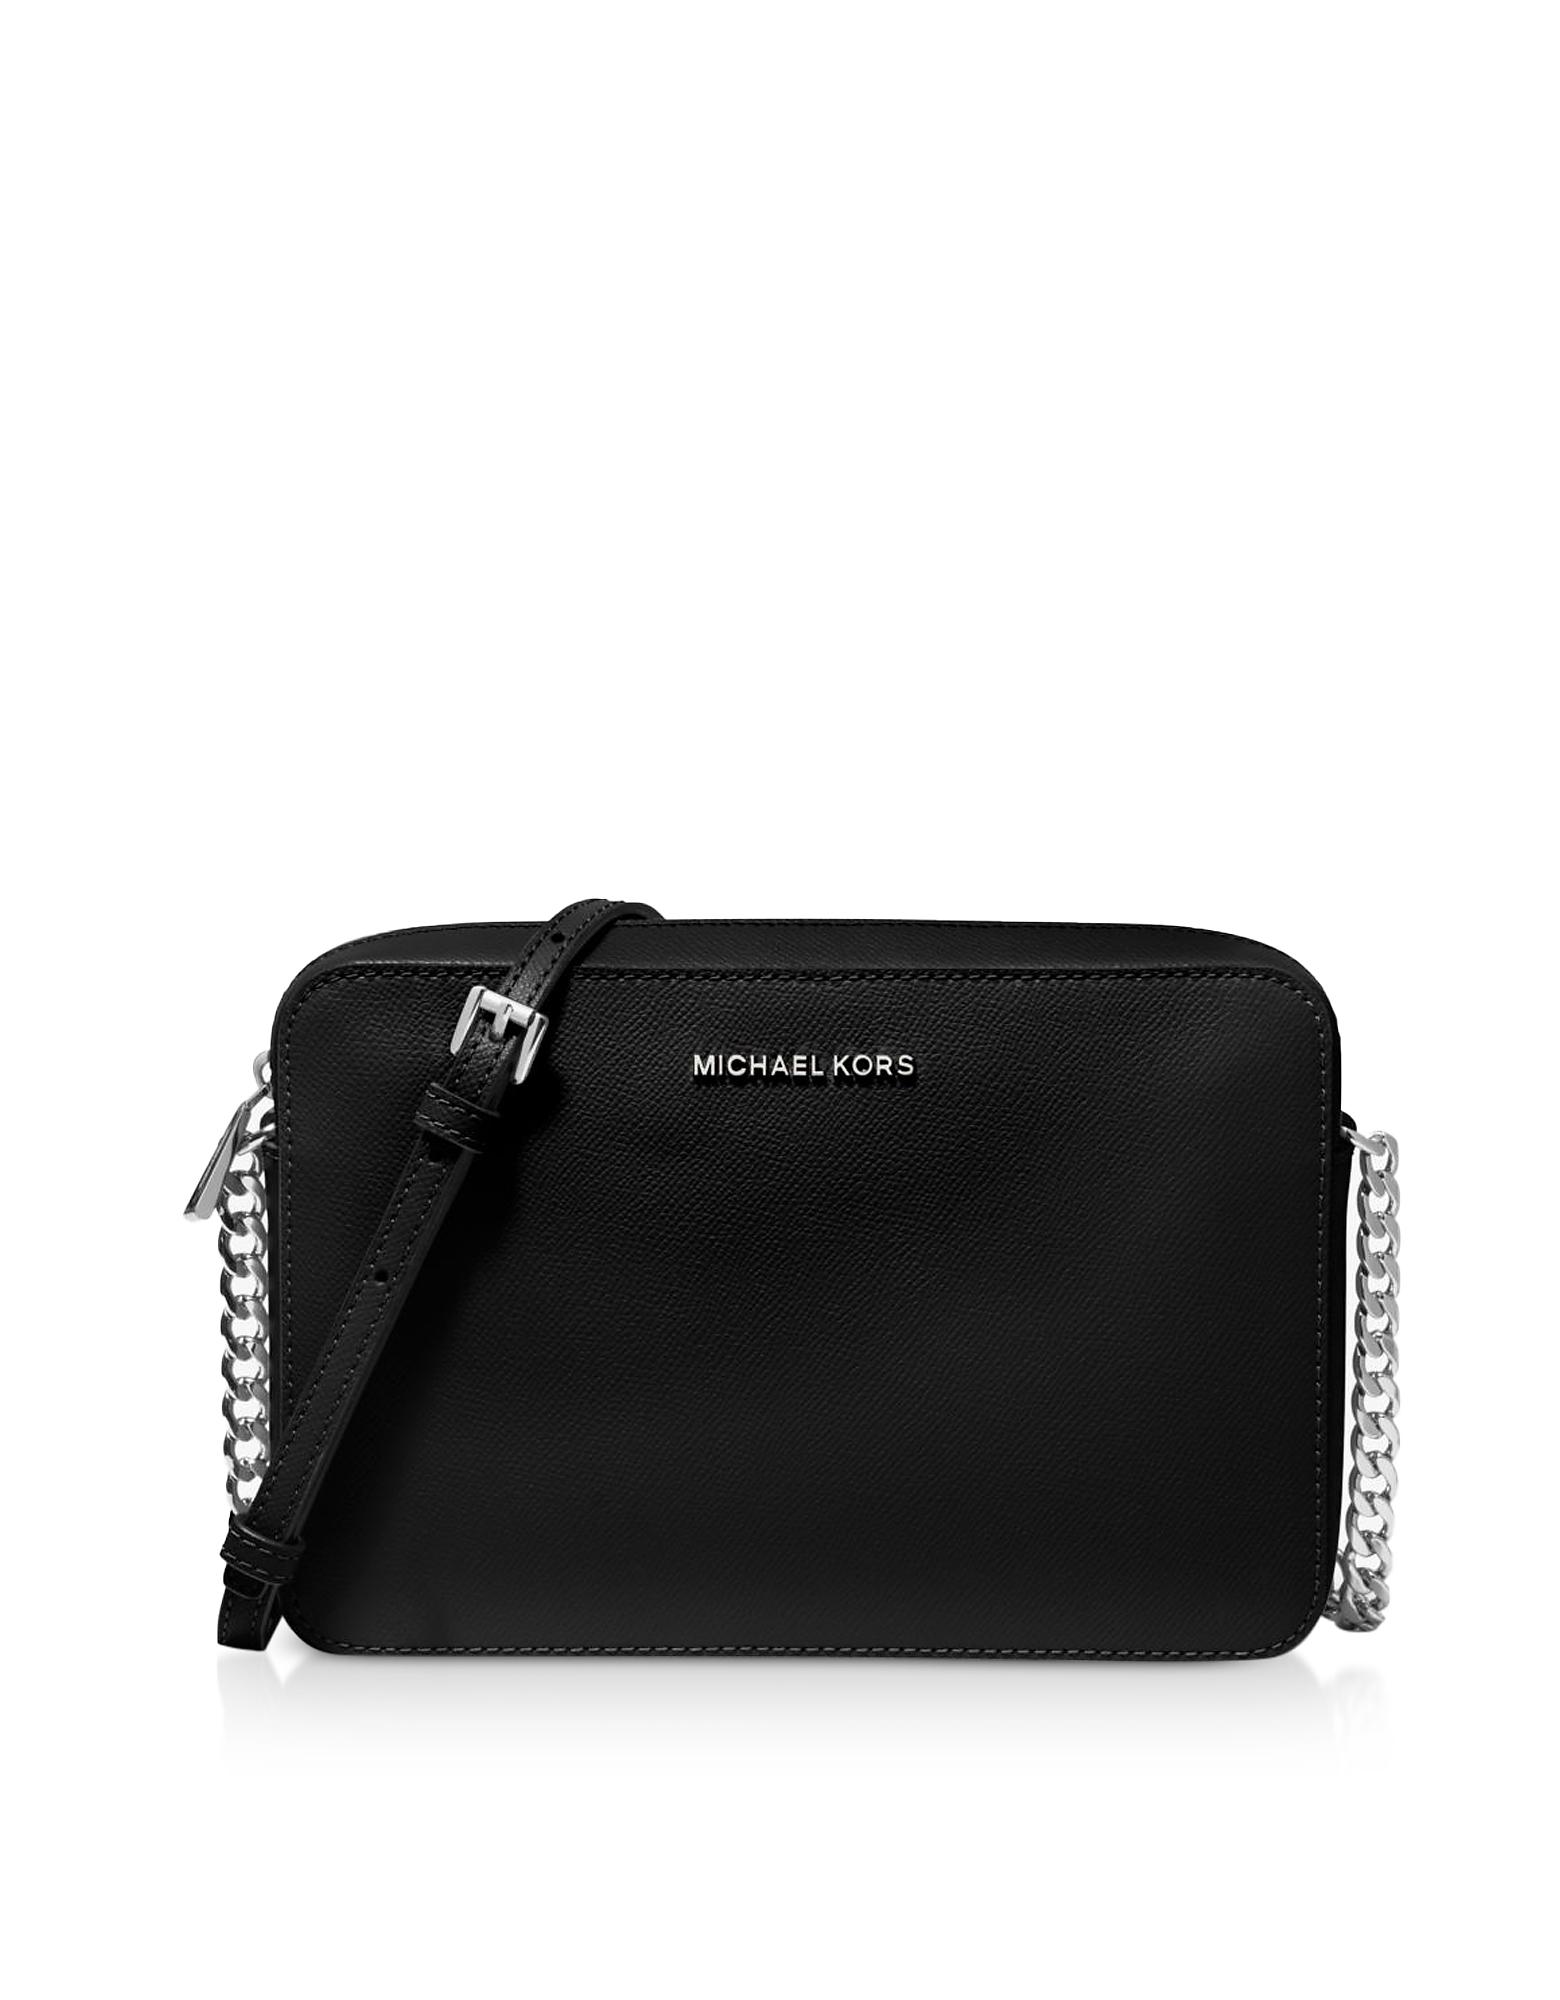 Michael Kors Designer Handbags, Jet Set Large Saffiano Leather Crossbody Bag